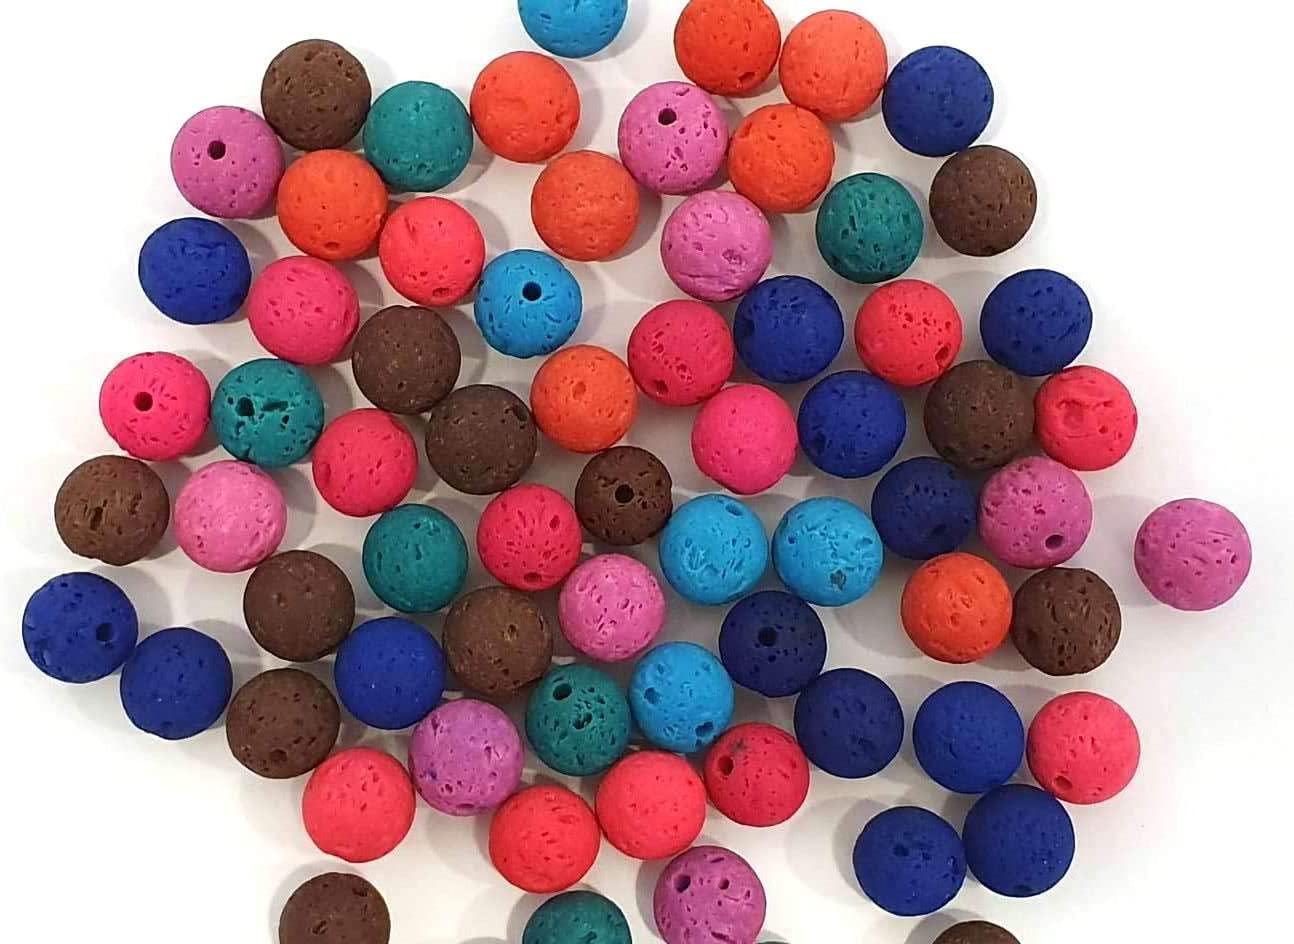 Piedras de lava de 10/8/6 mm, redondas, piedras preciosas naturales, Mix piedras preciosas,6mm 50 Stück